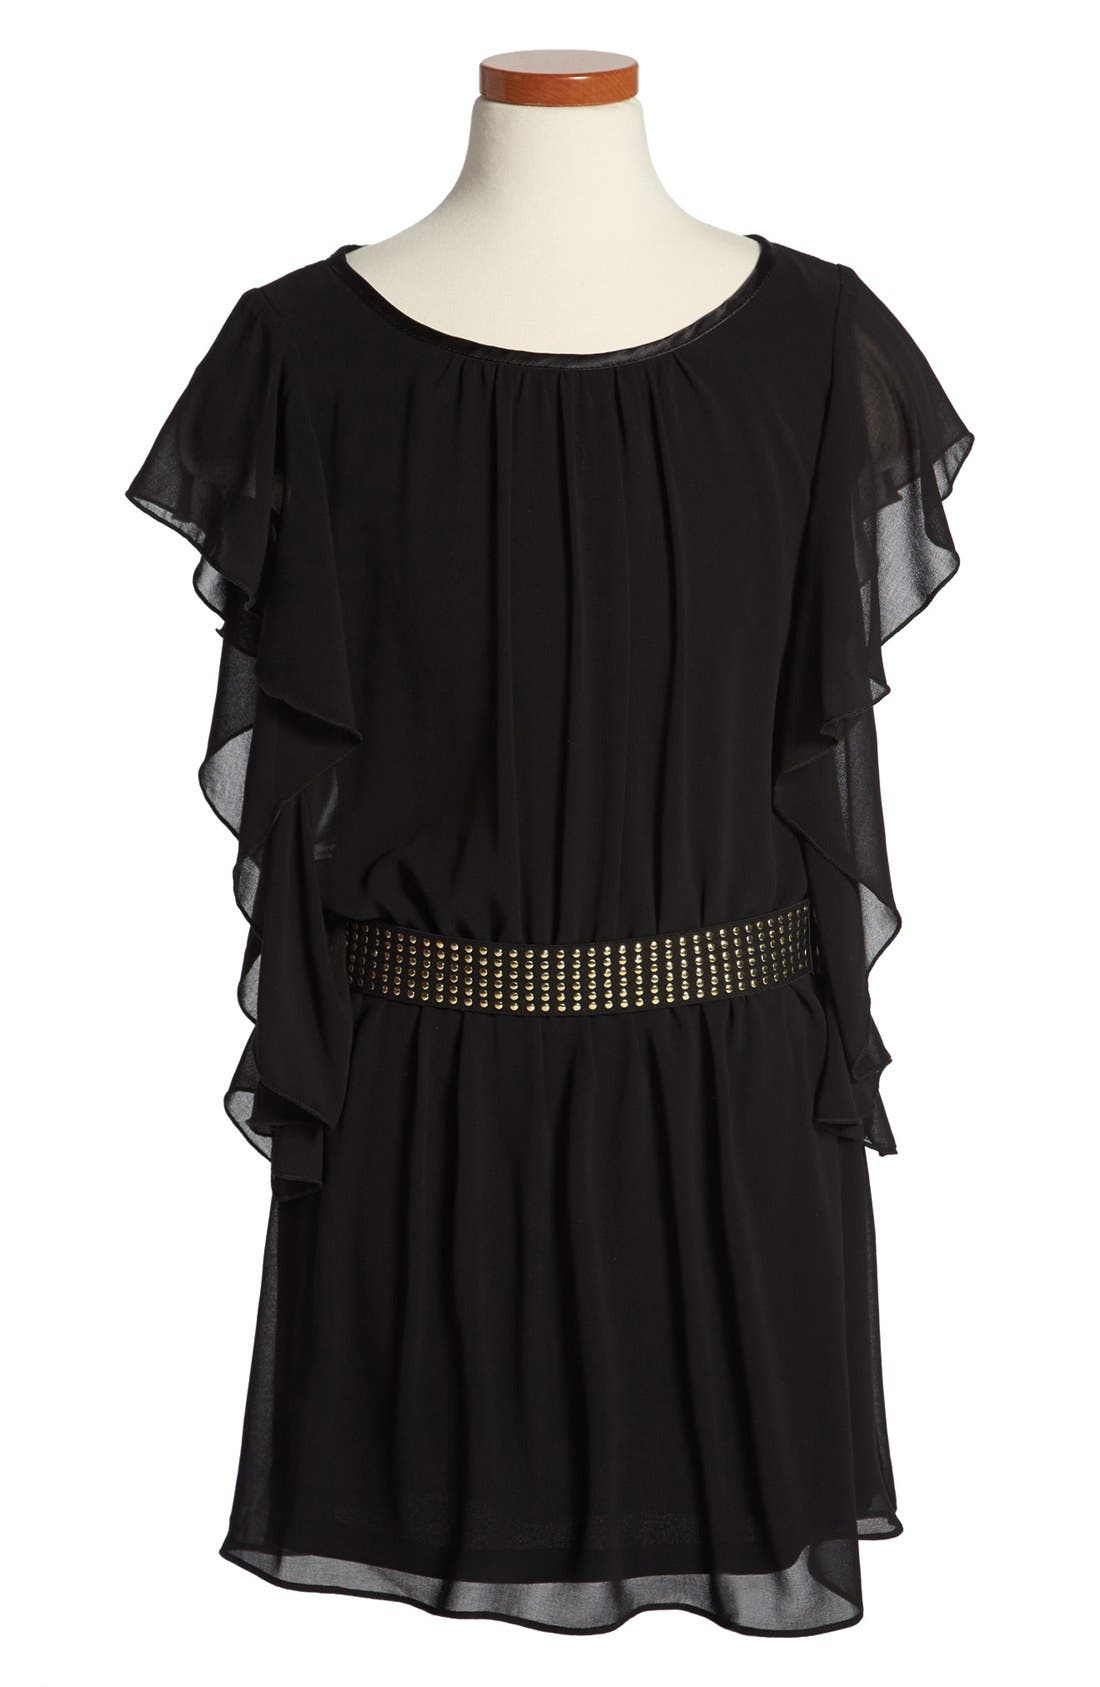 Alternate Image 1 Selected - Sally Miller Butterfly Sleeve Dress (Big Girls)